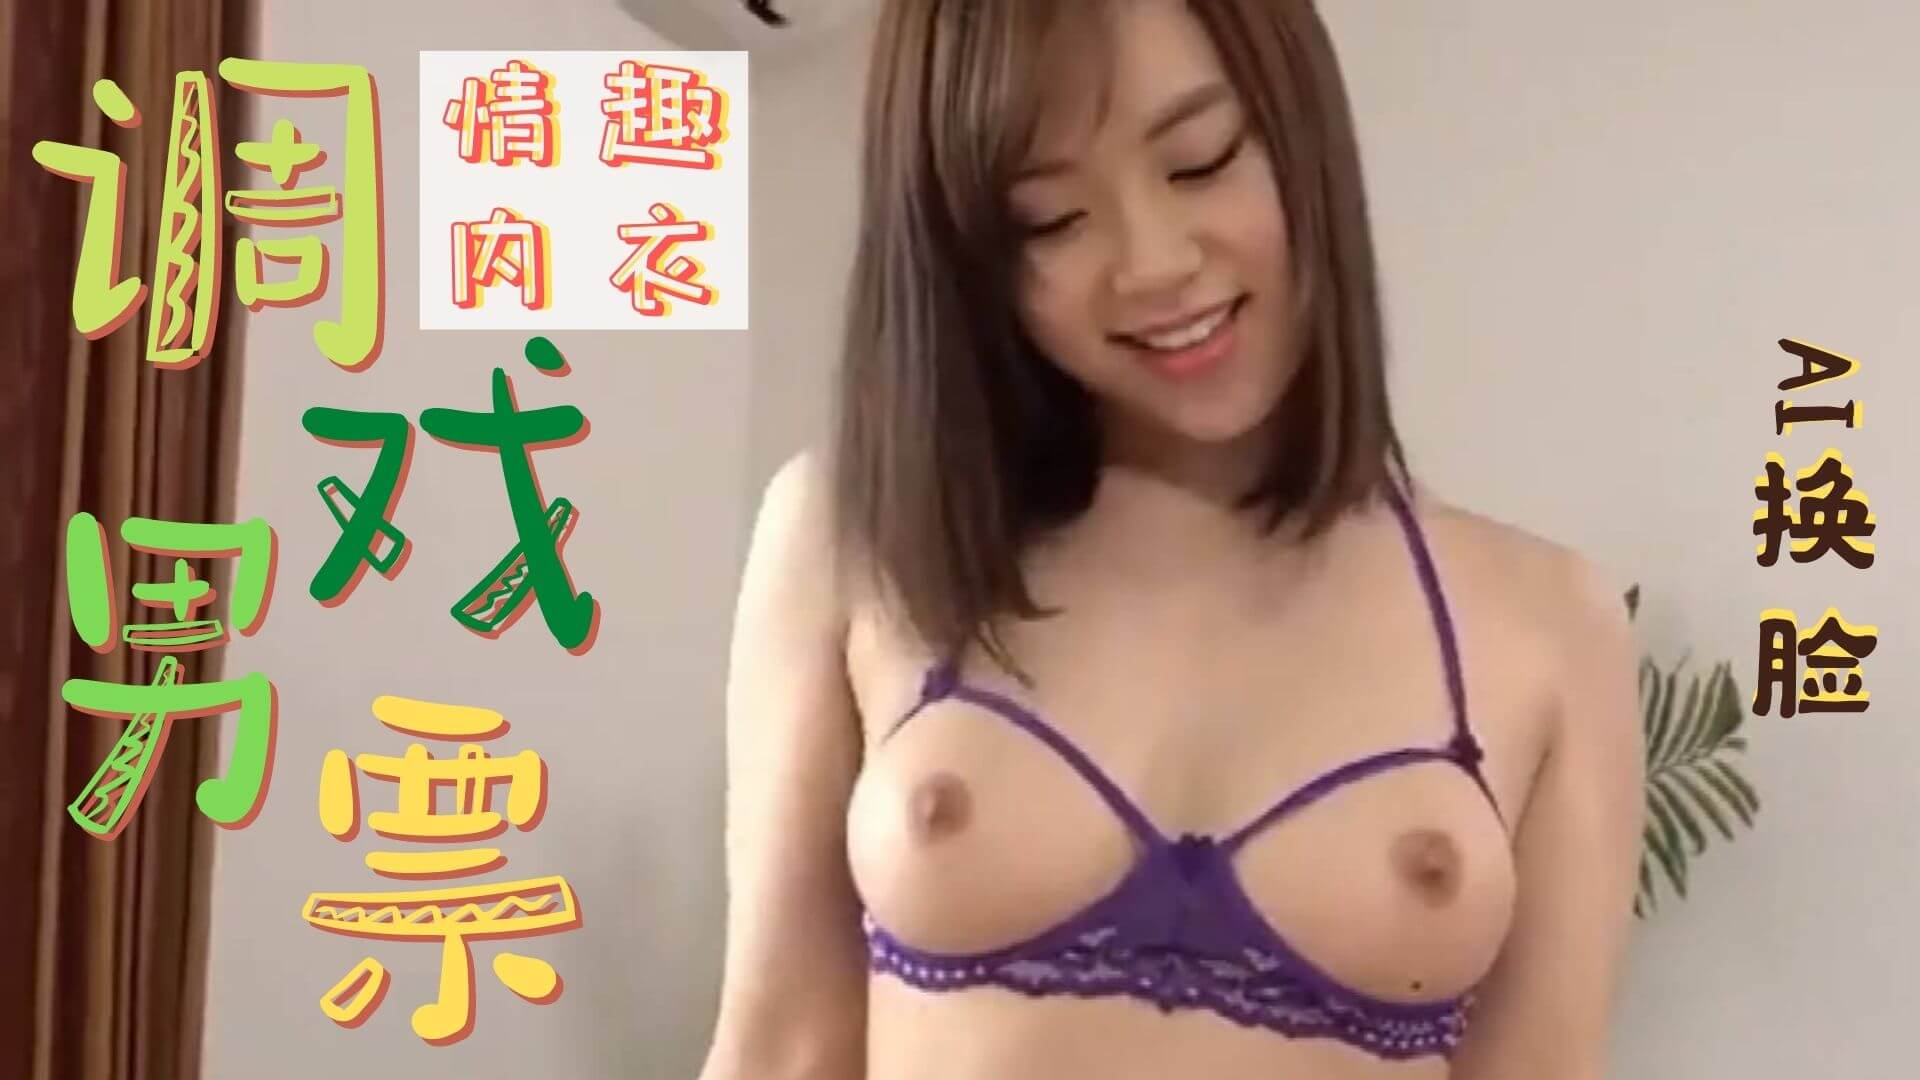 Al—孫彩瑛 调戏男票